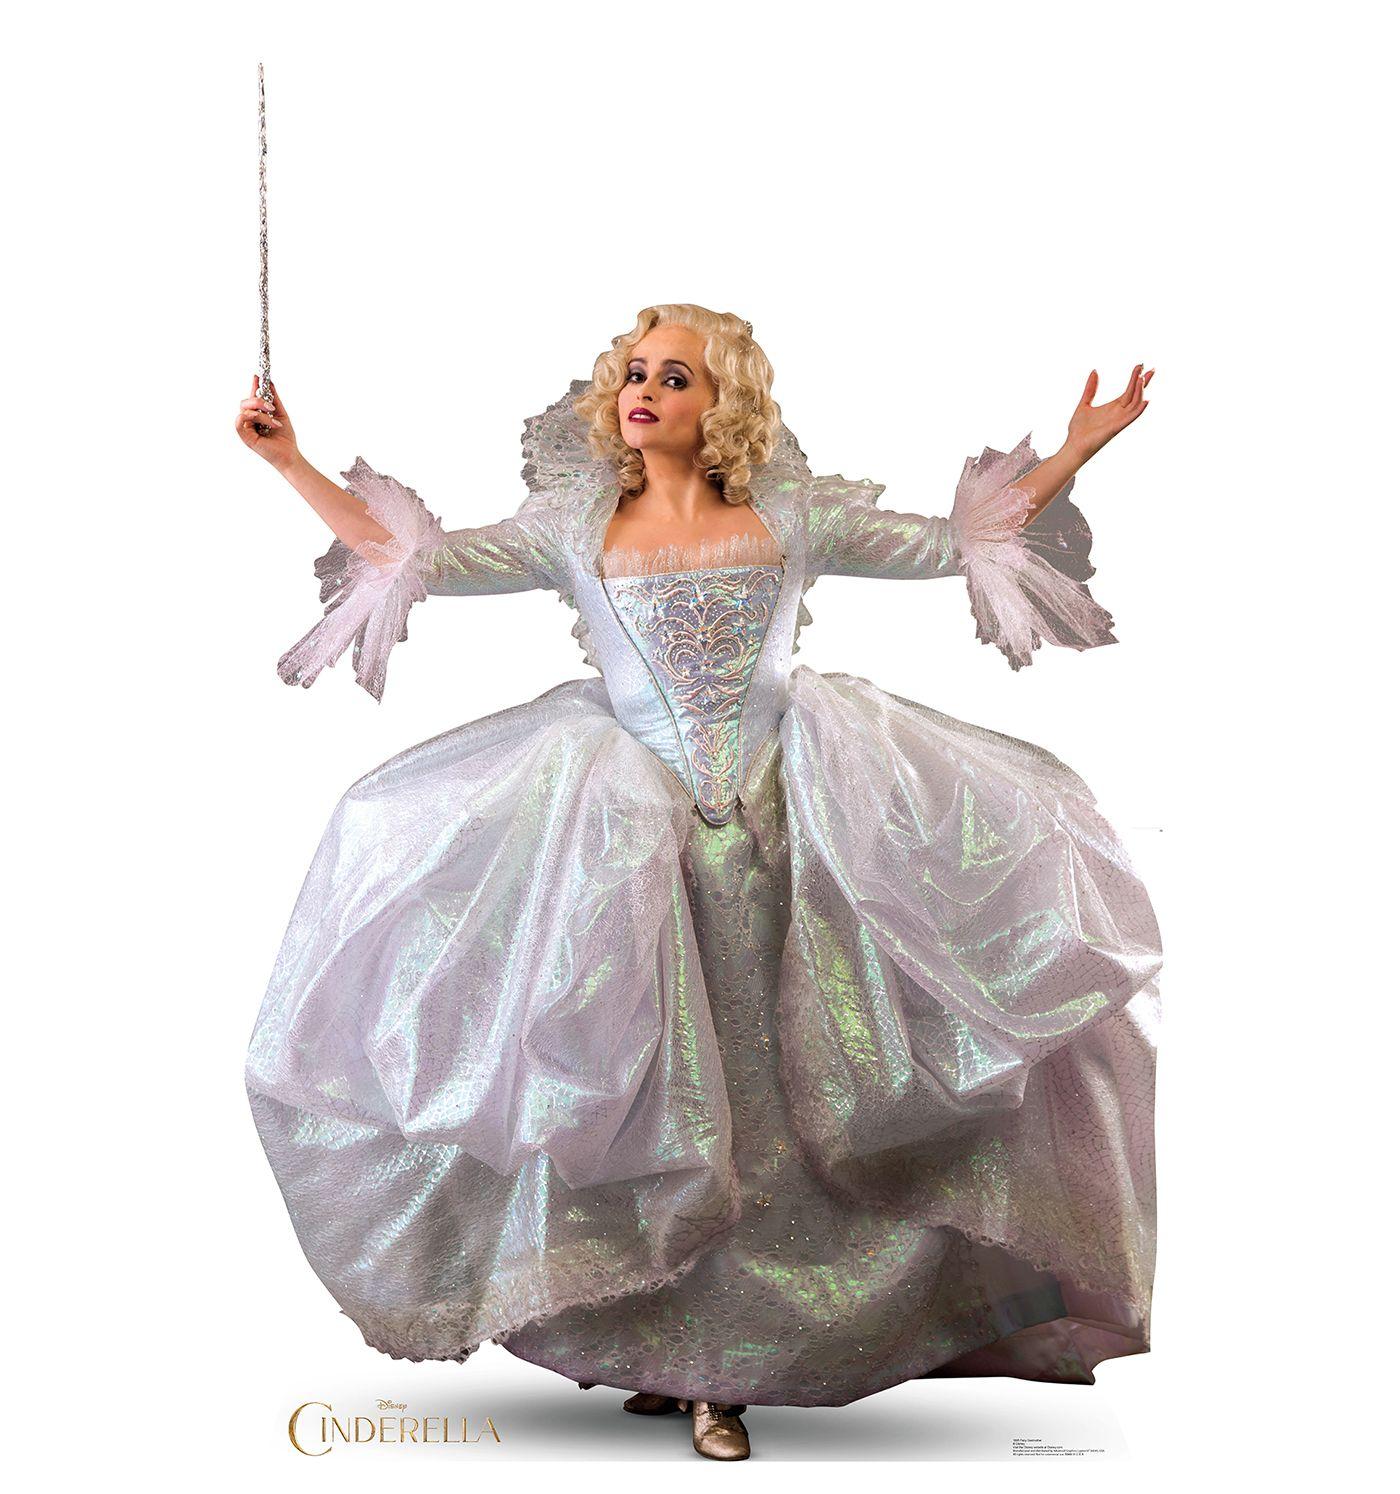 Cinderella S Fairy Godmother Fairy Godmother Costume Cinderella Fairy Godmother Godmother Dress